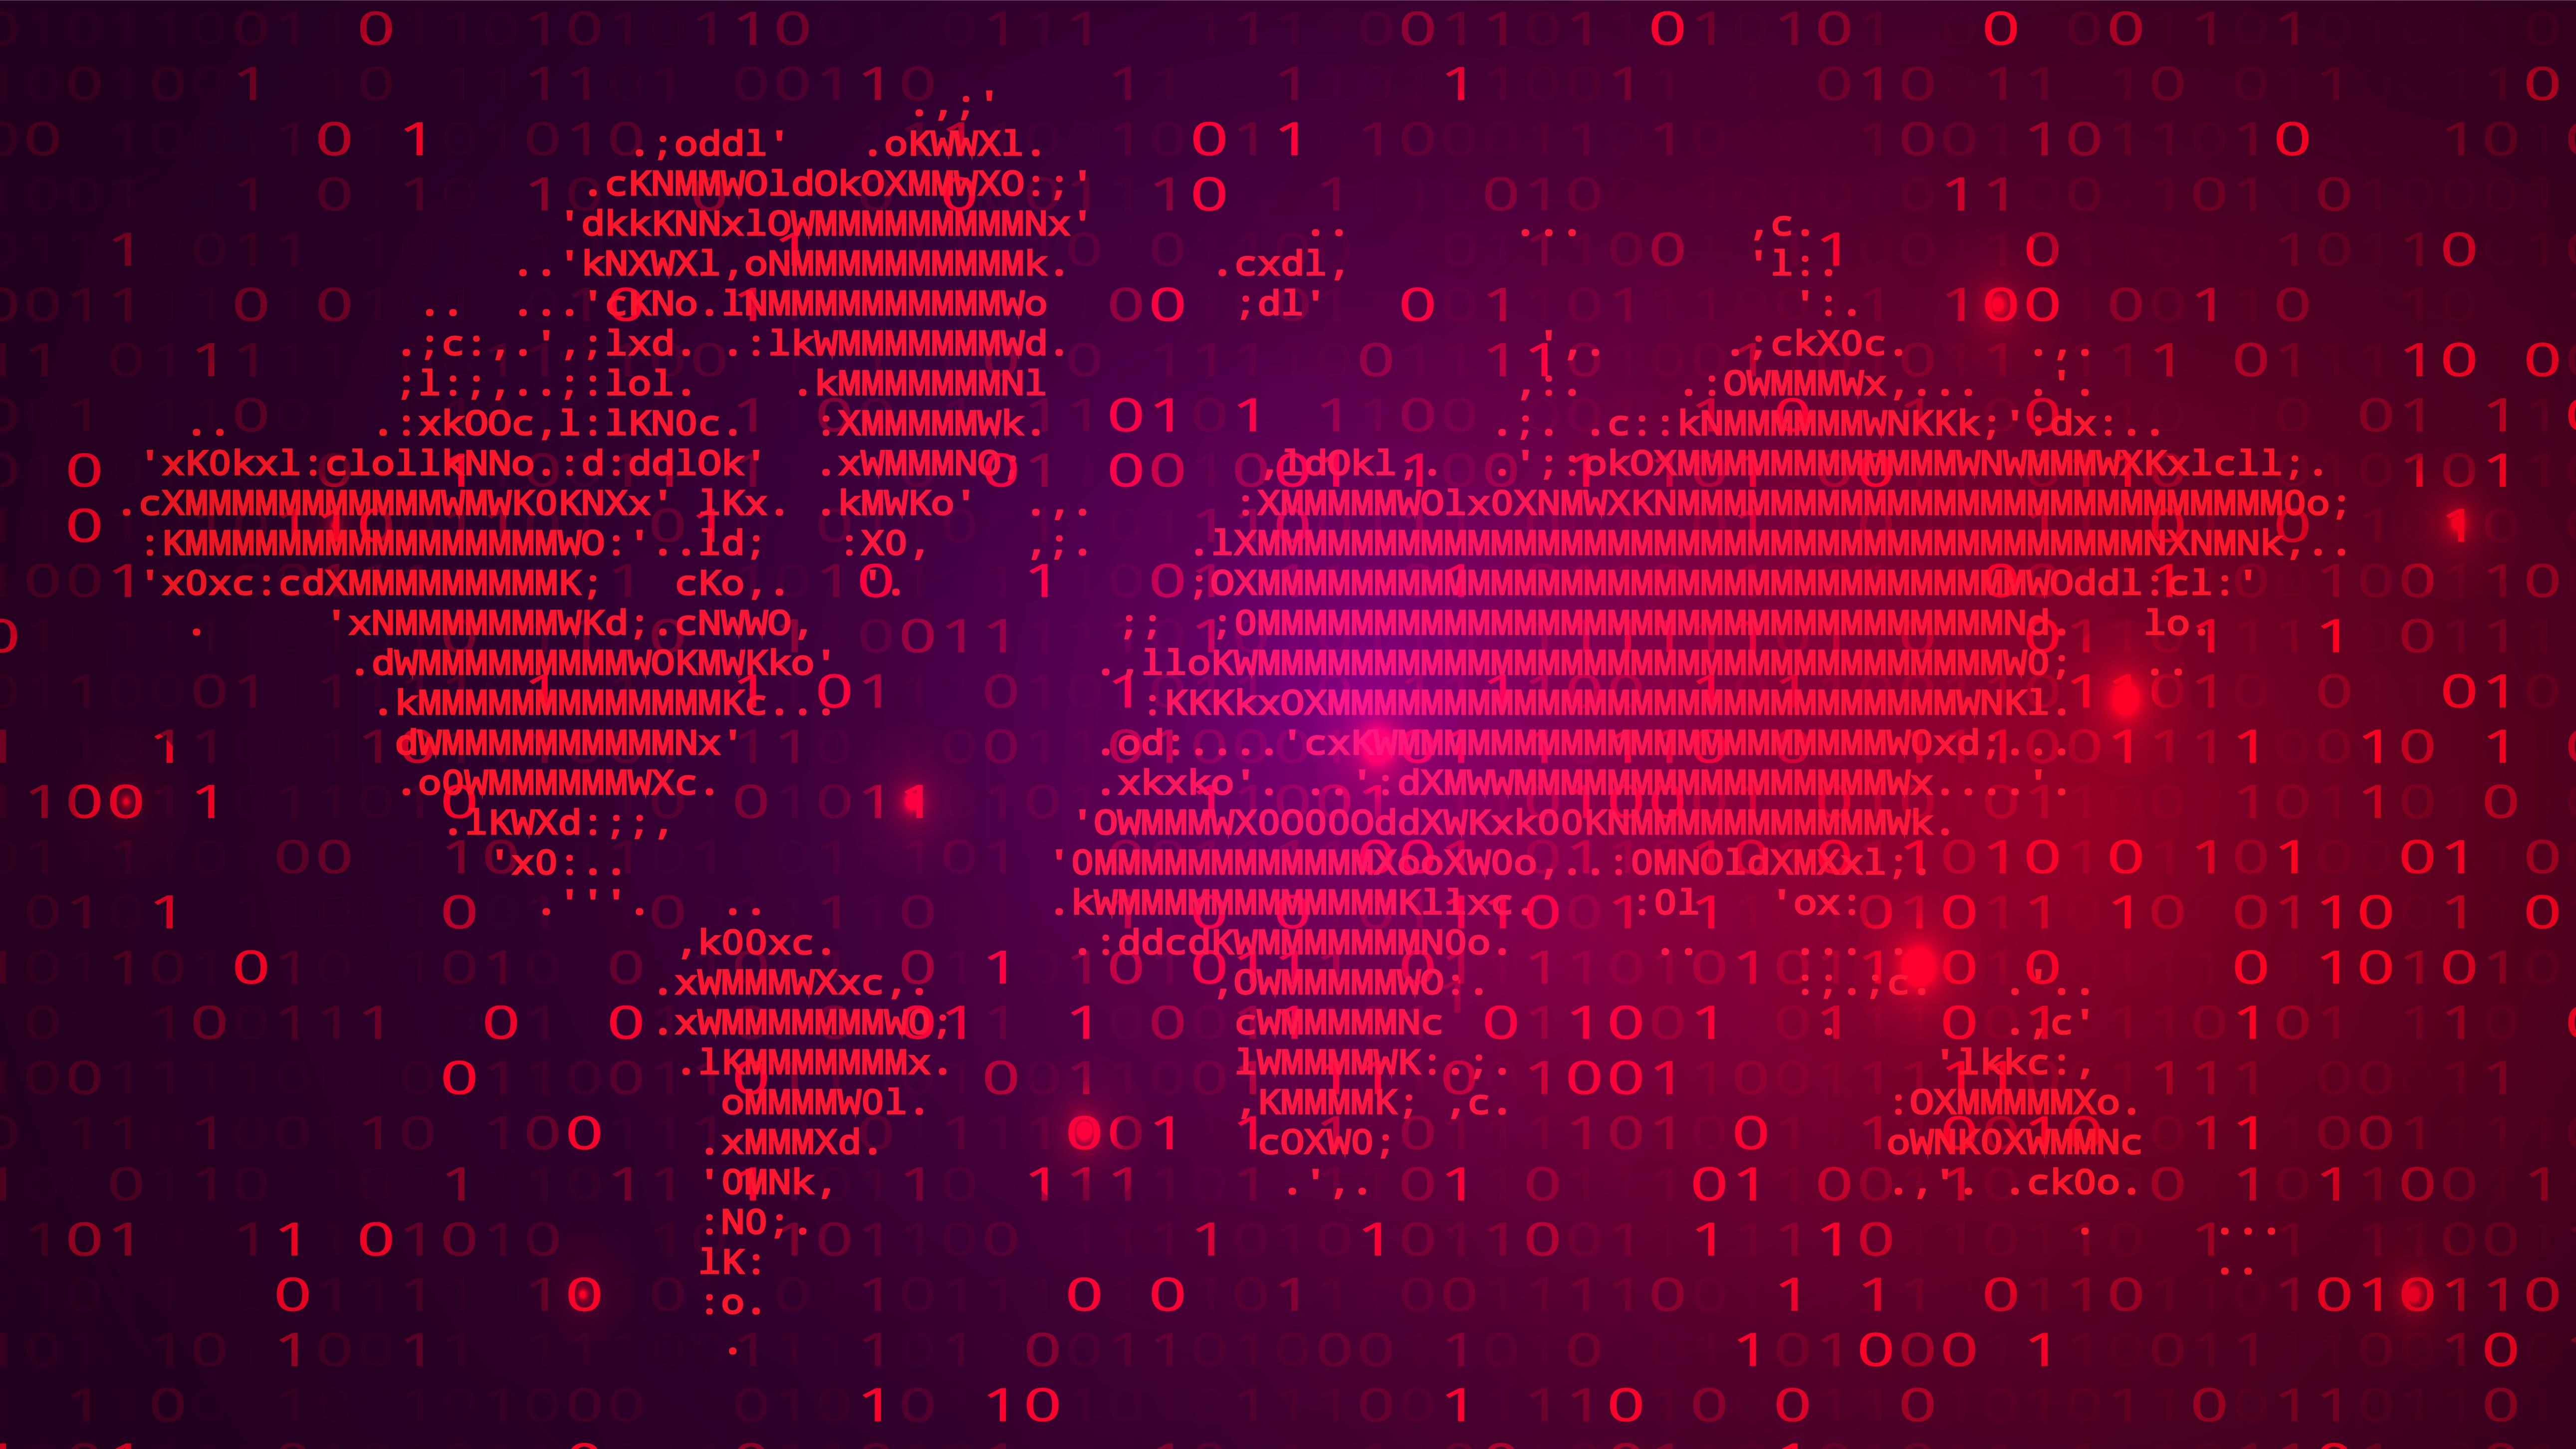 BGP Hijacking Hotspots